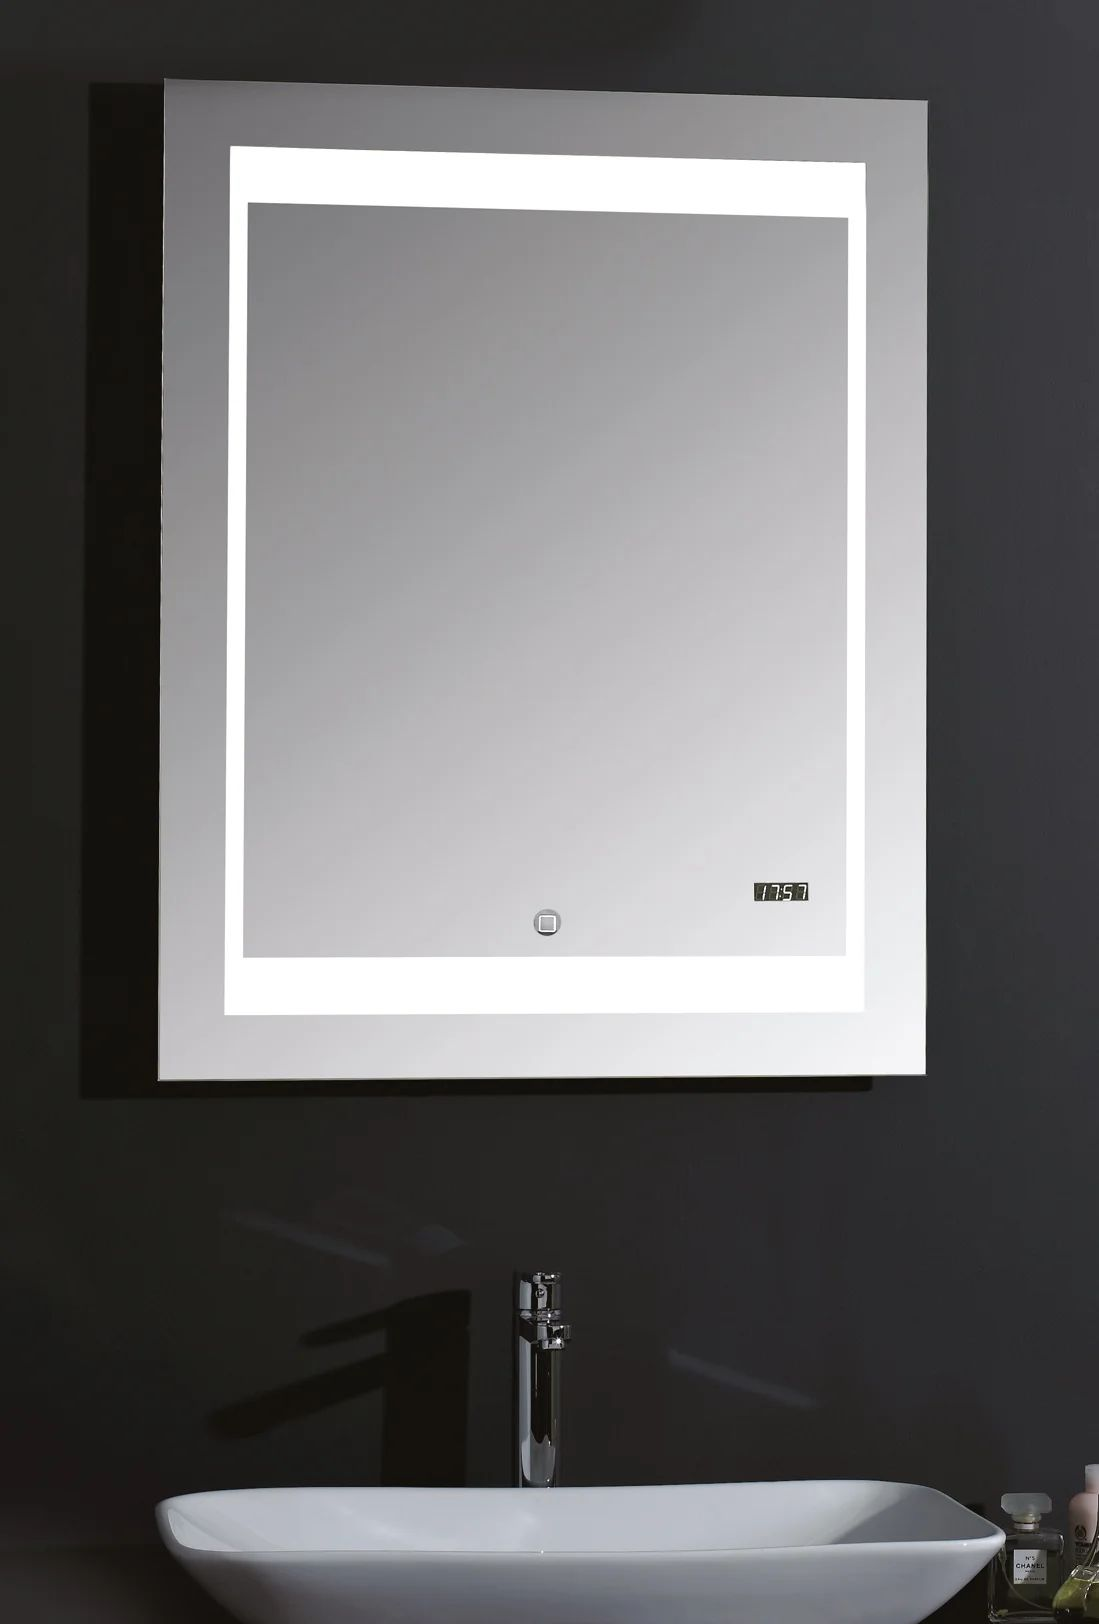 Miroir Lumineux Avec Eclairage Integre L 70 X H 90 Cm Silver Futura Leroy Merlin